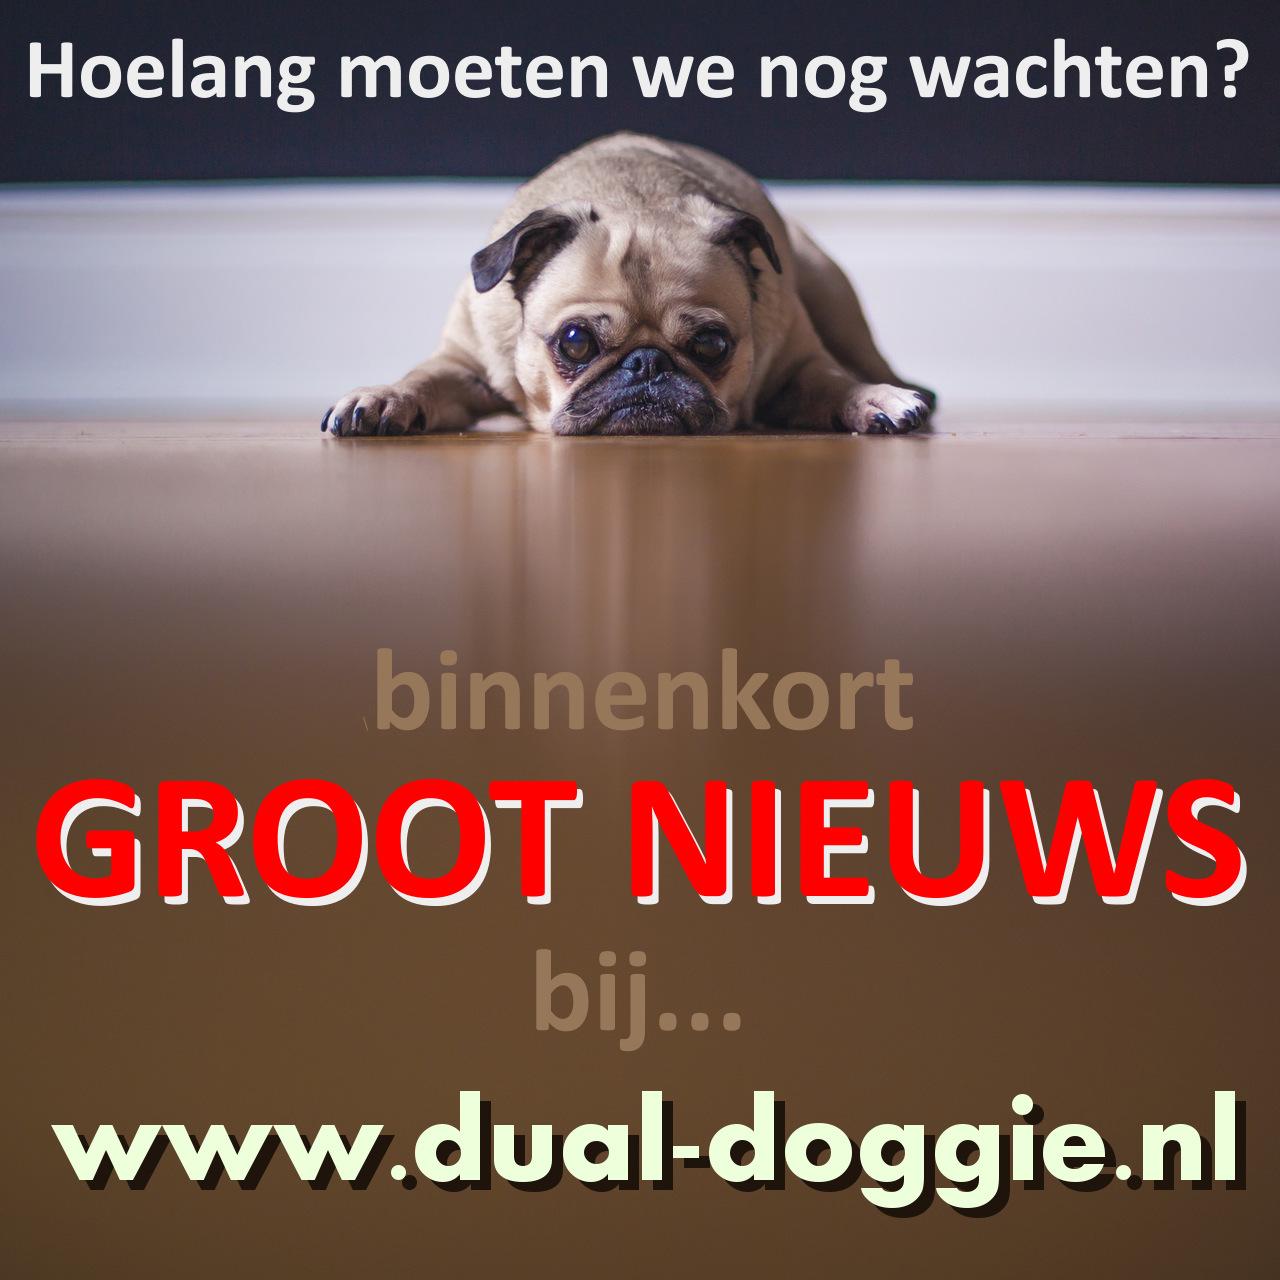 Binnenkort is de dual-doggie te koop bij www.dual-doggie.nl